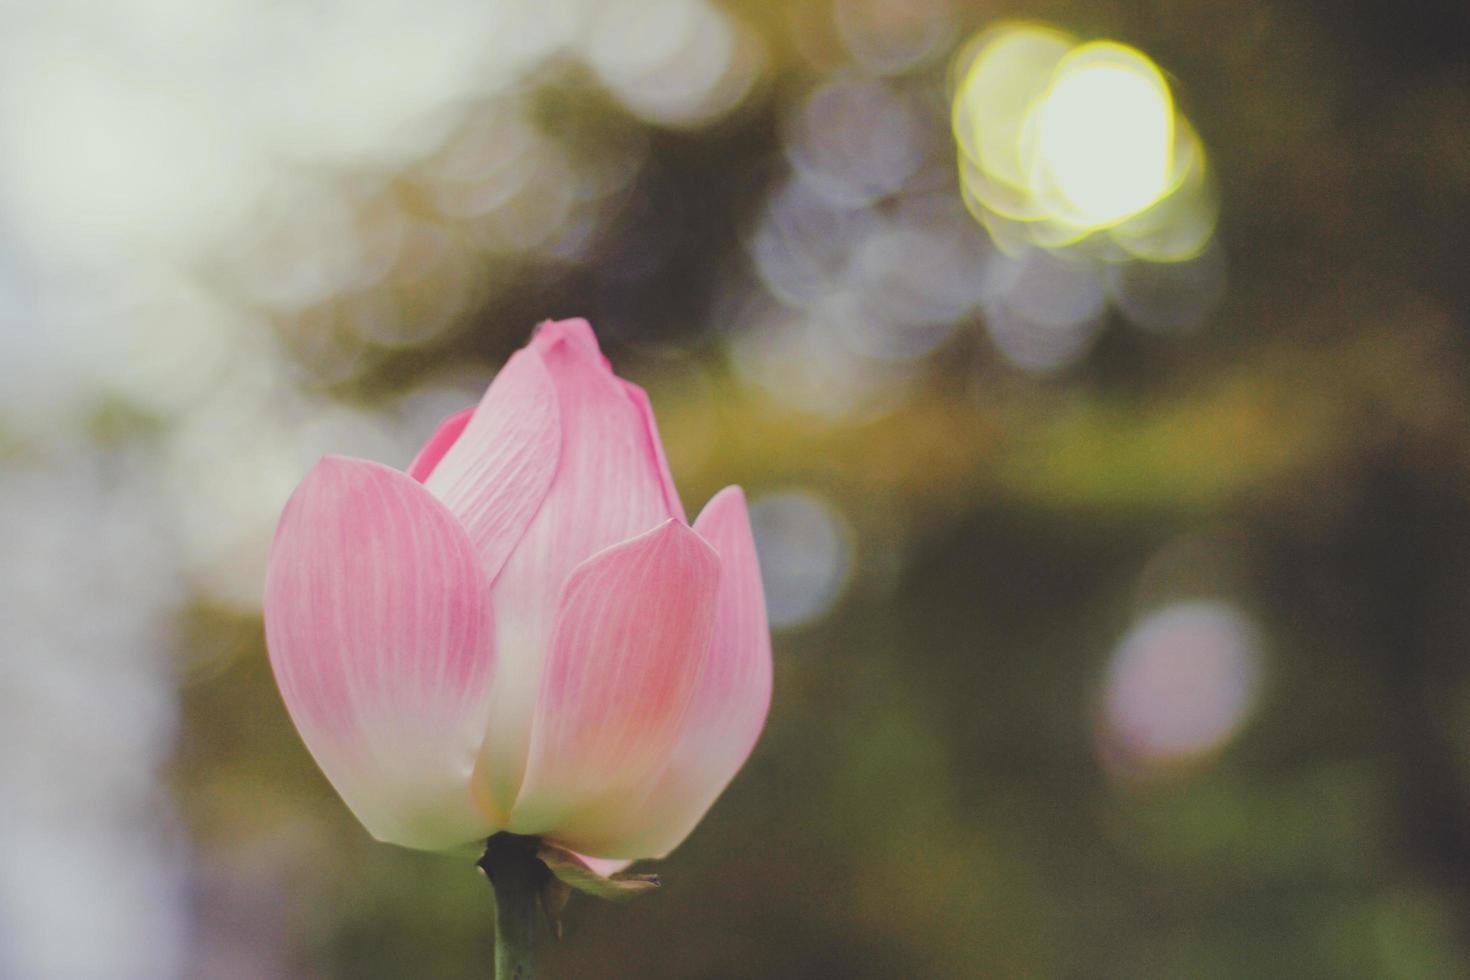 Soft focus of pink lotus flower photo